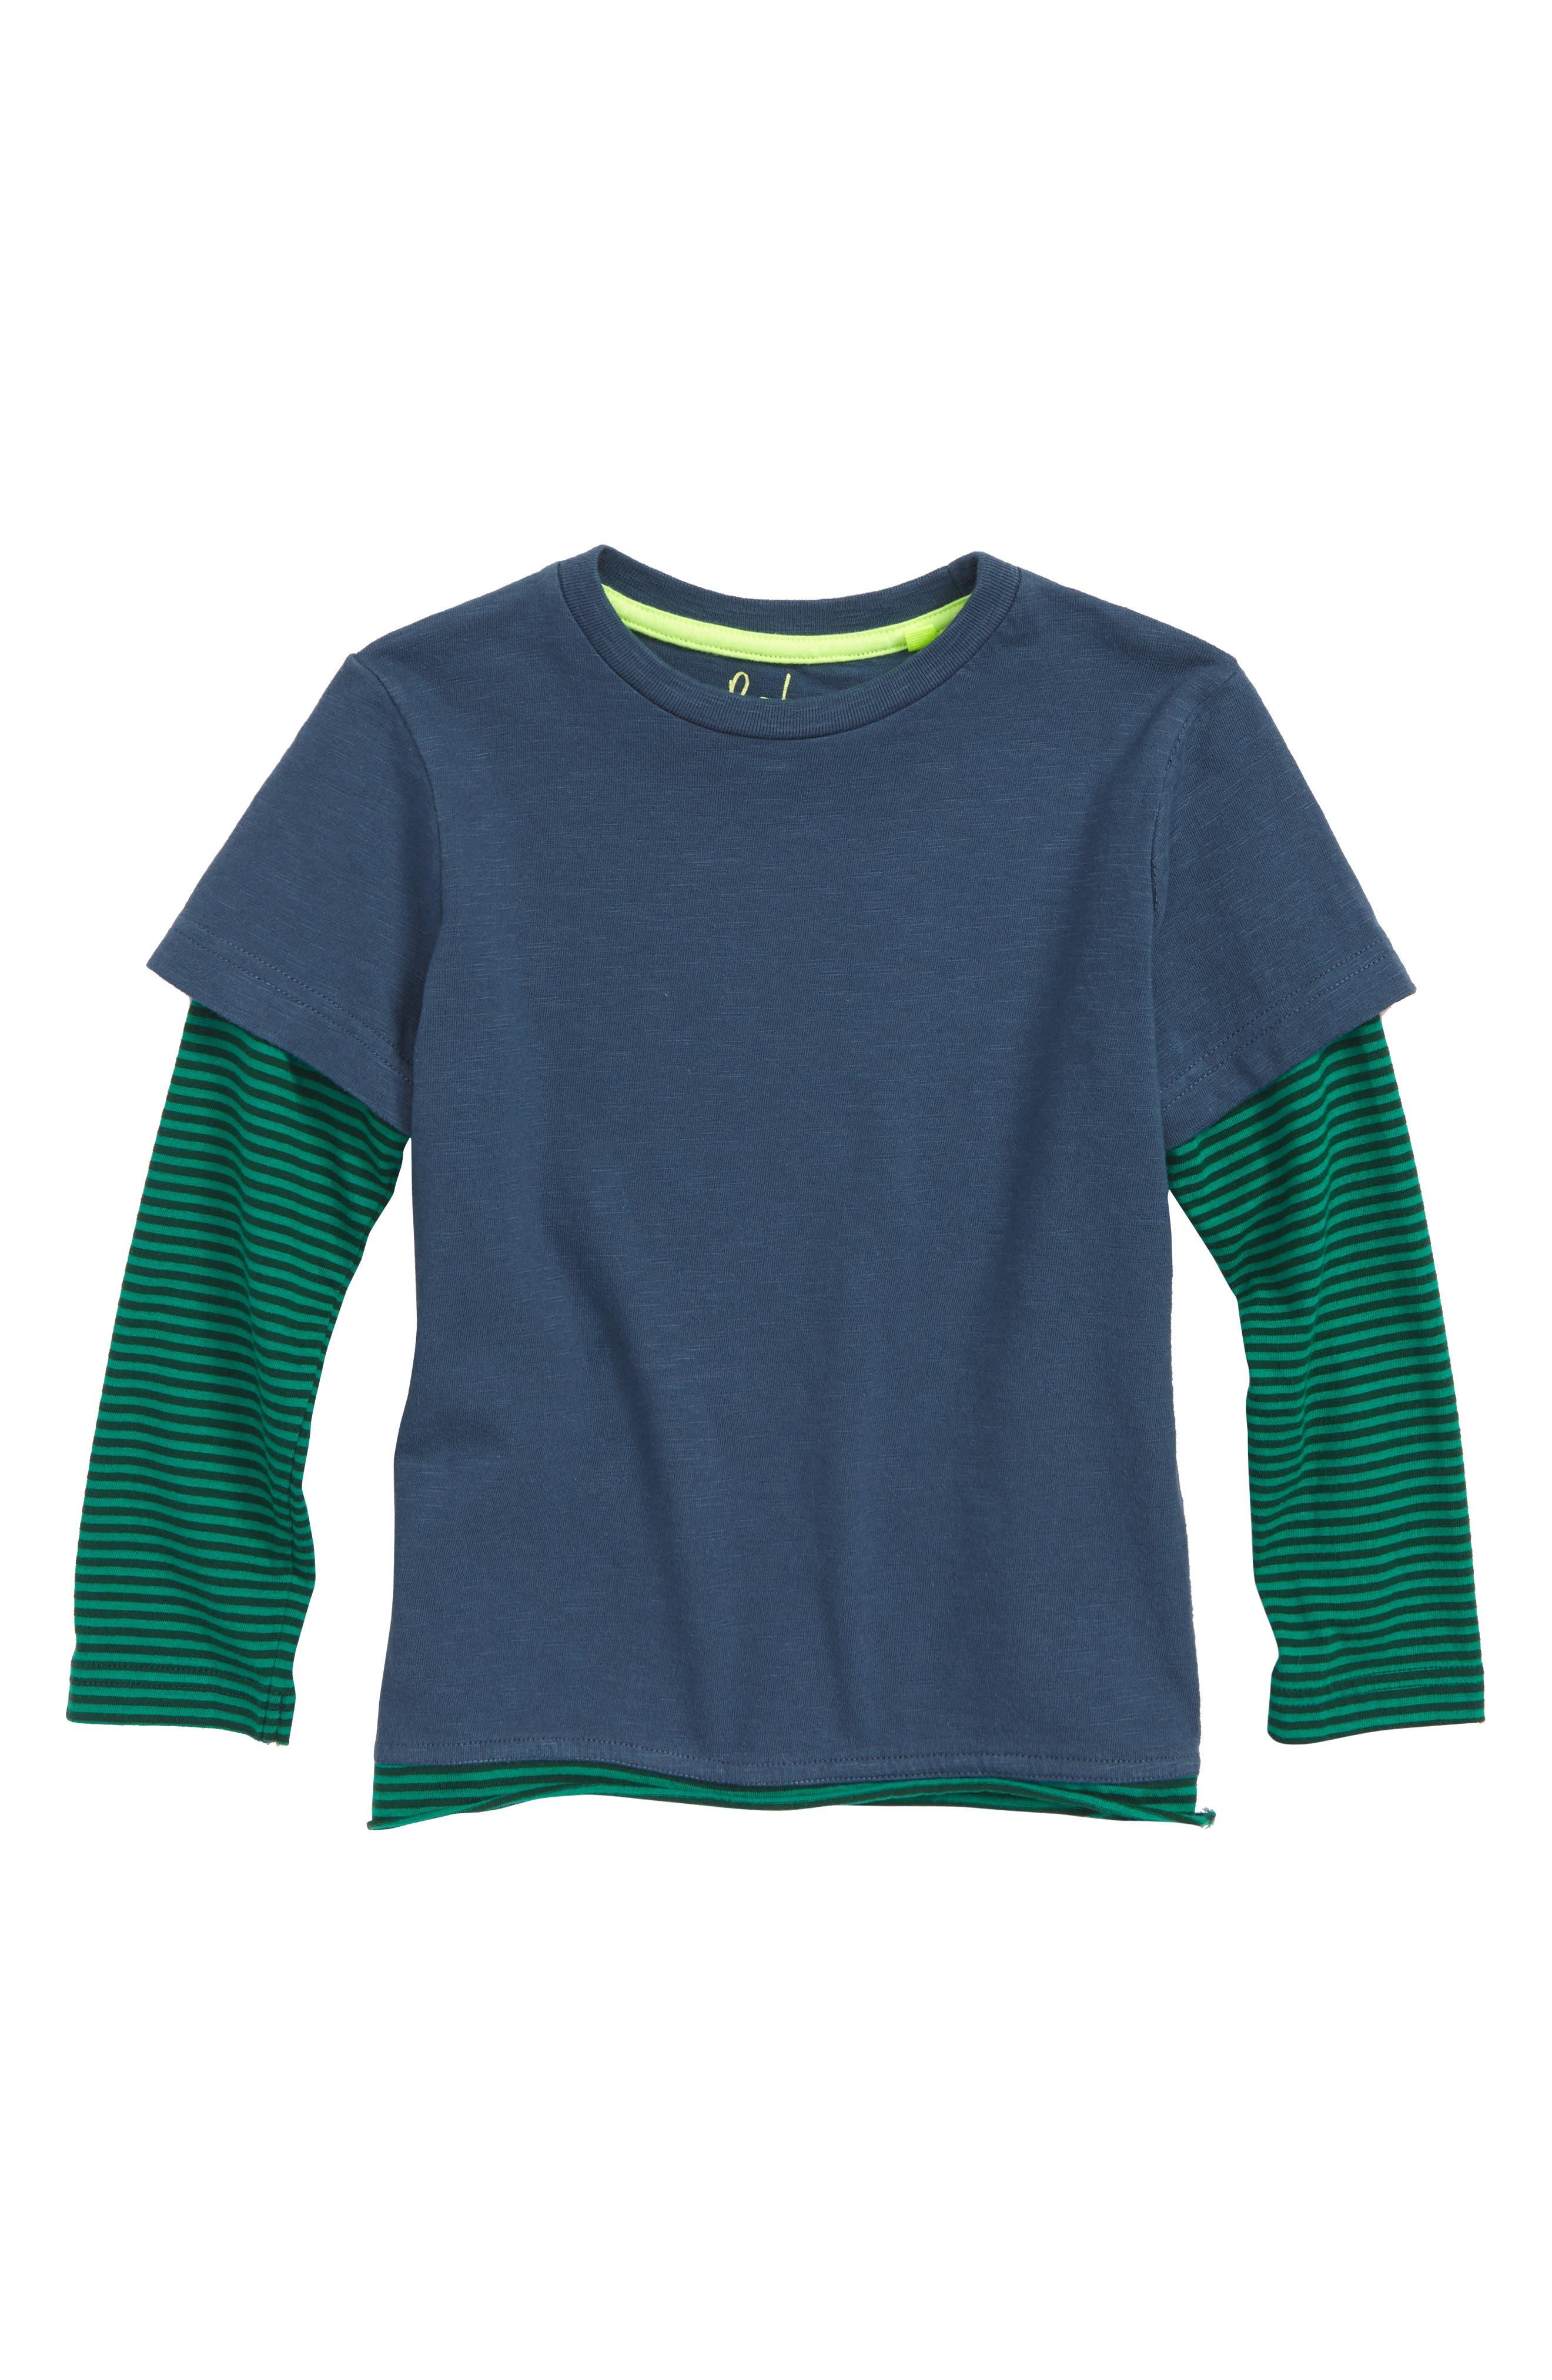 MINI BODEN,                             Layered T-Shirt,                             Main thumbnail 1, color,                             424